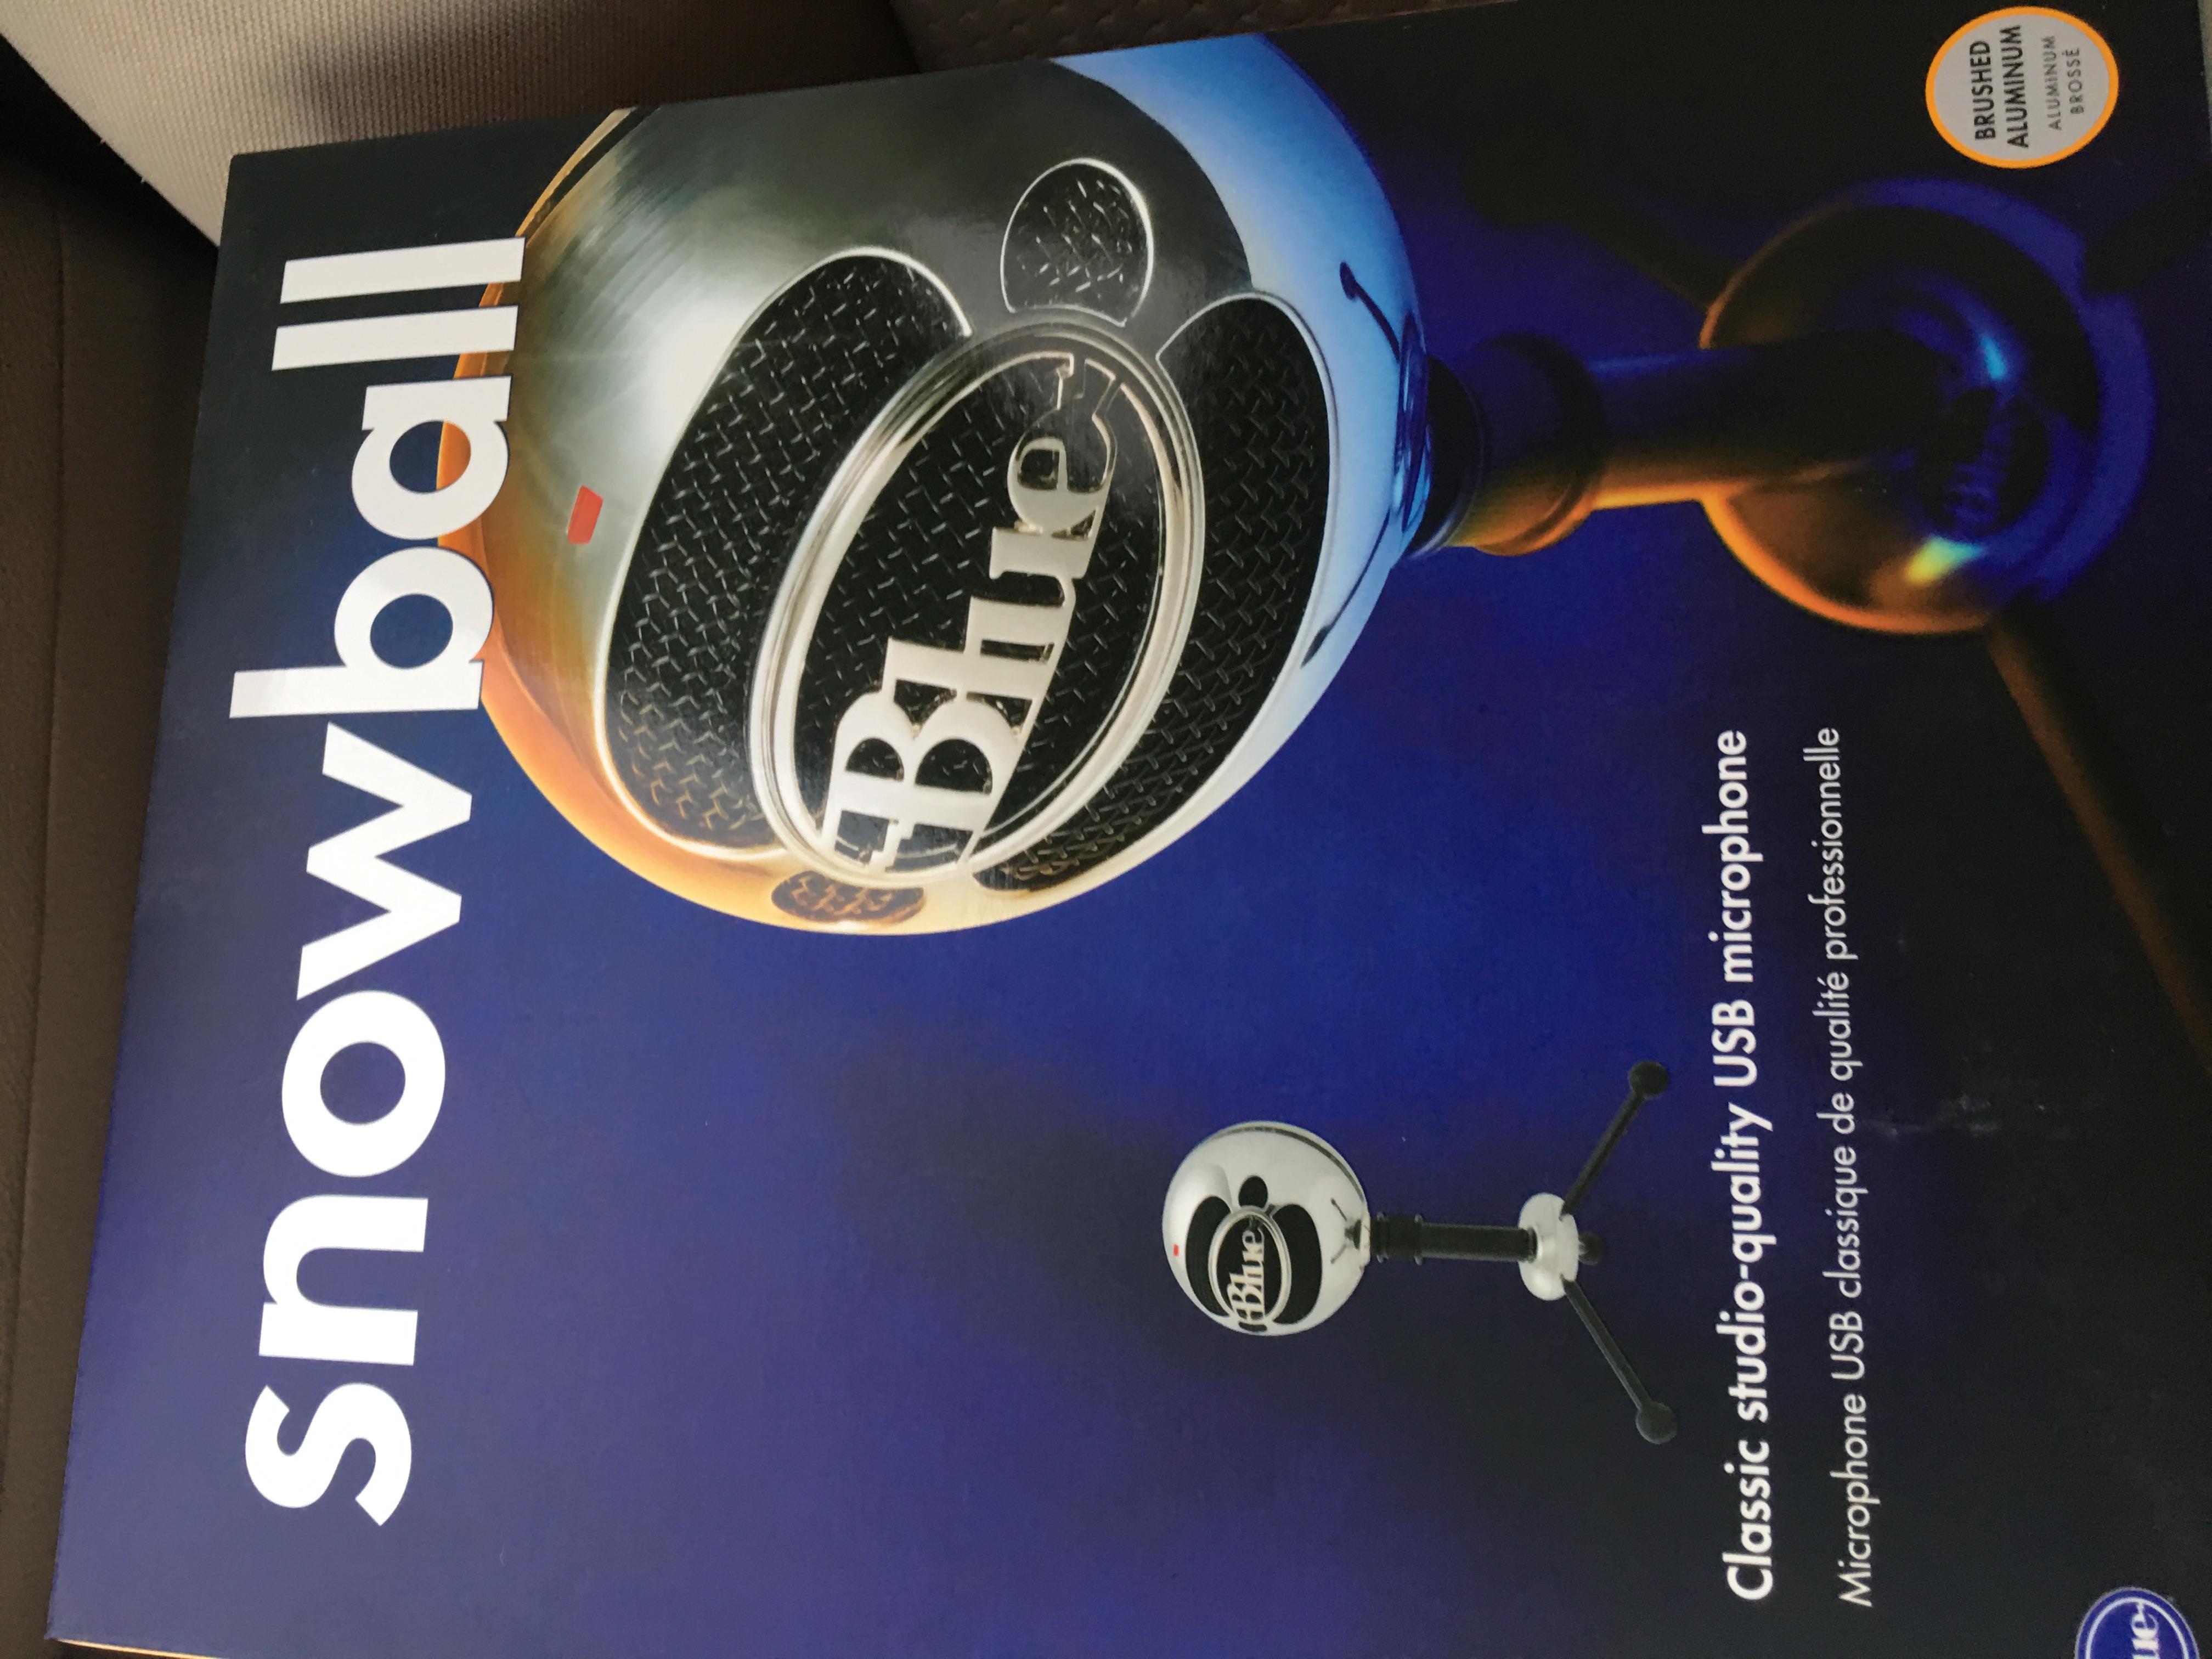 Blue Snowball USB Microphone for $29.98 at Sam's Club (B&M, YMMV)